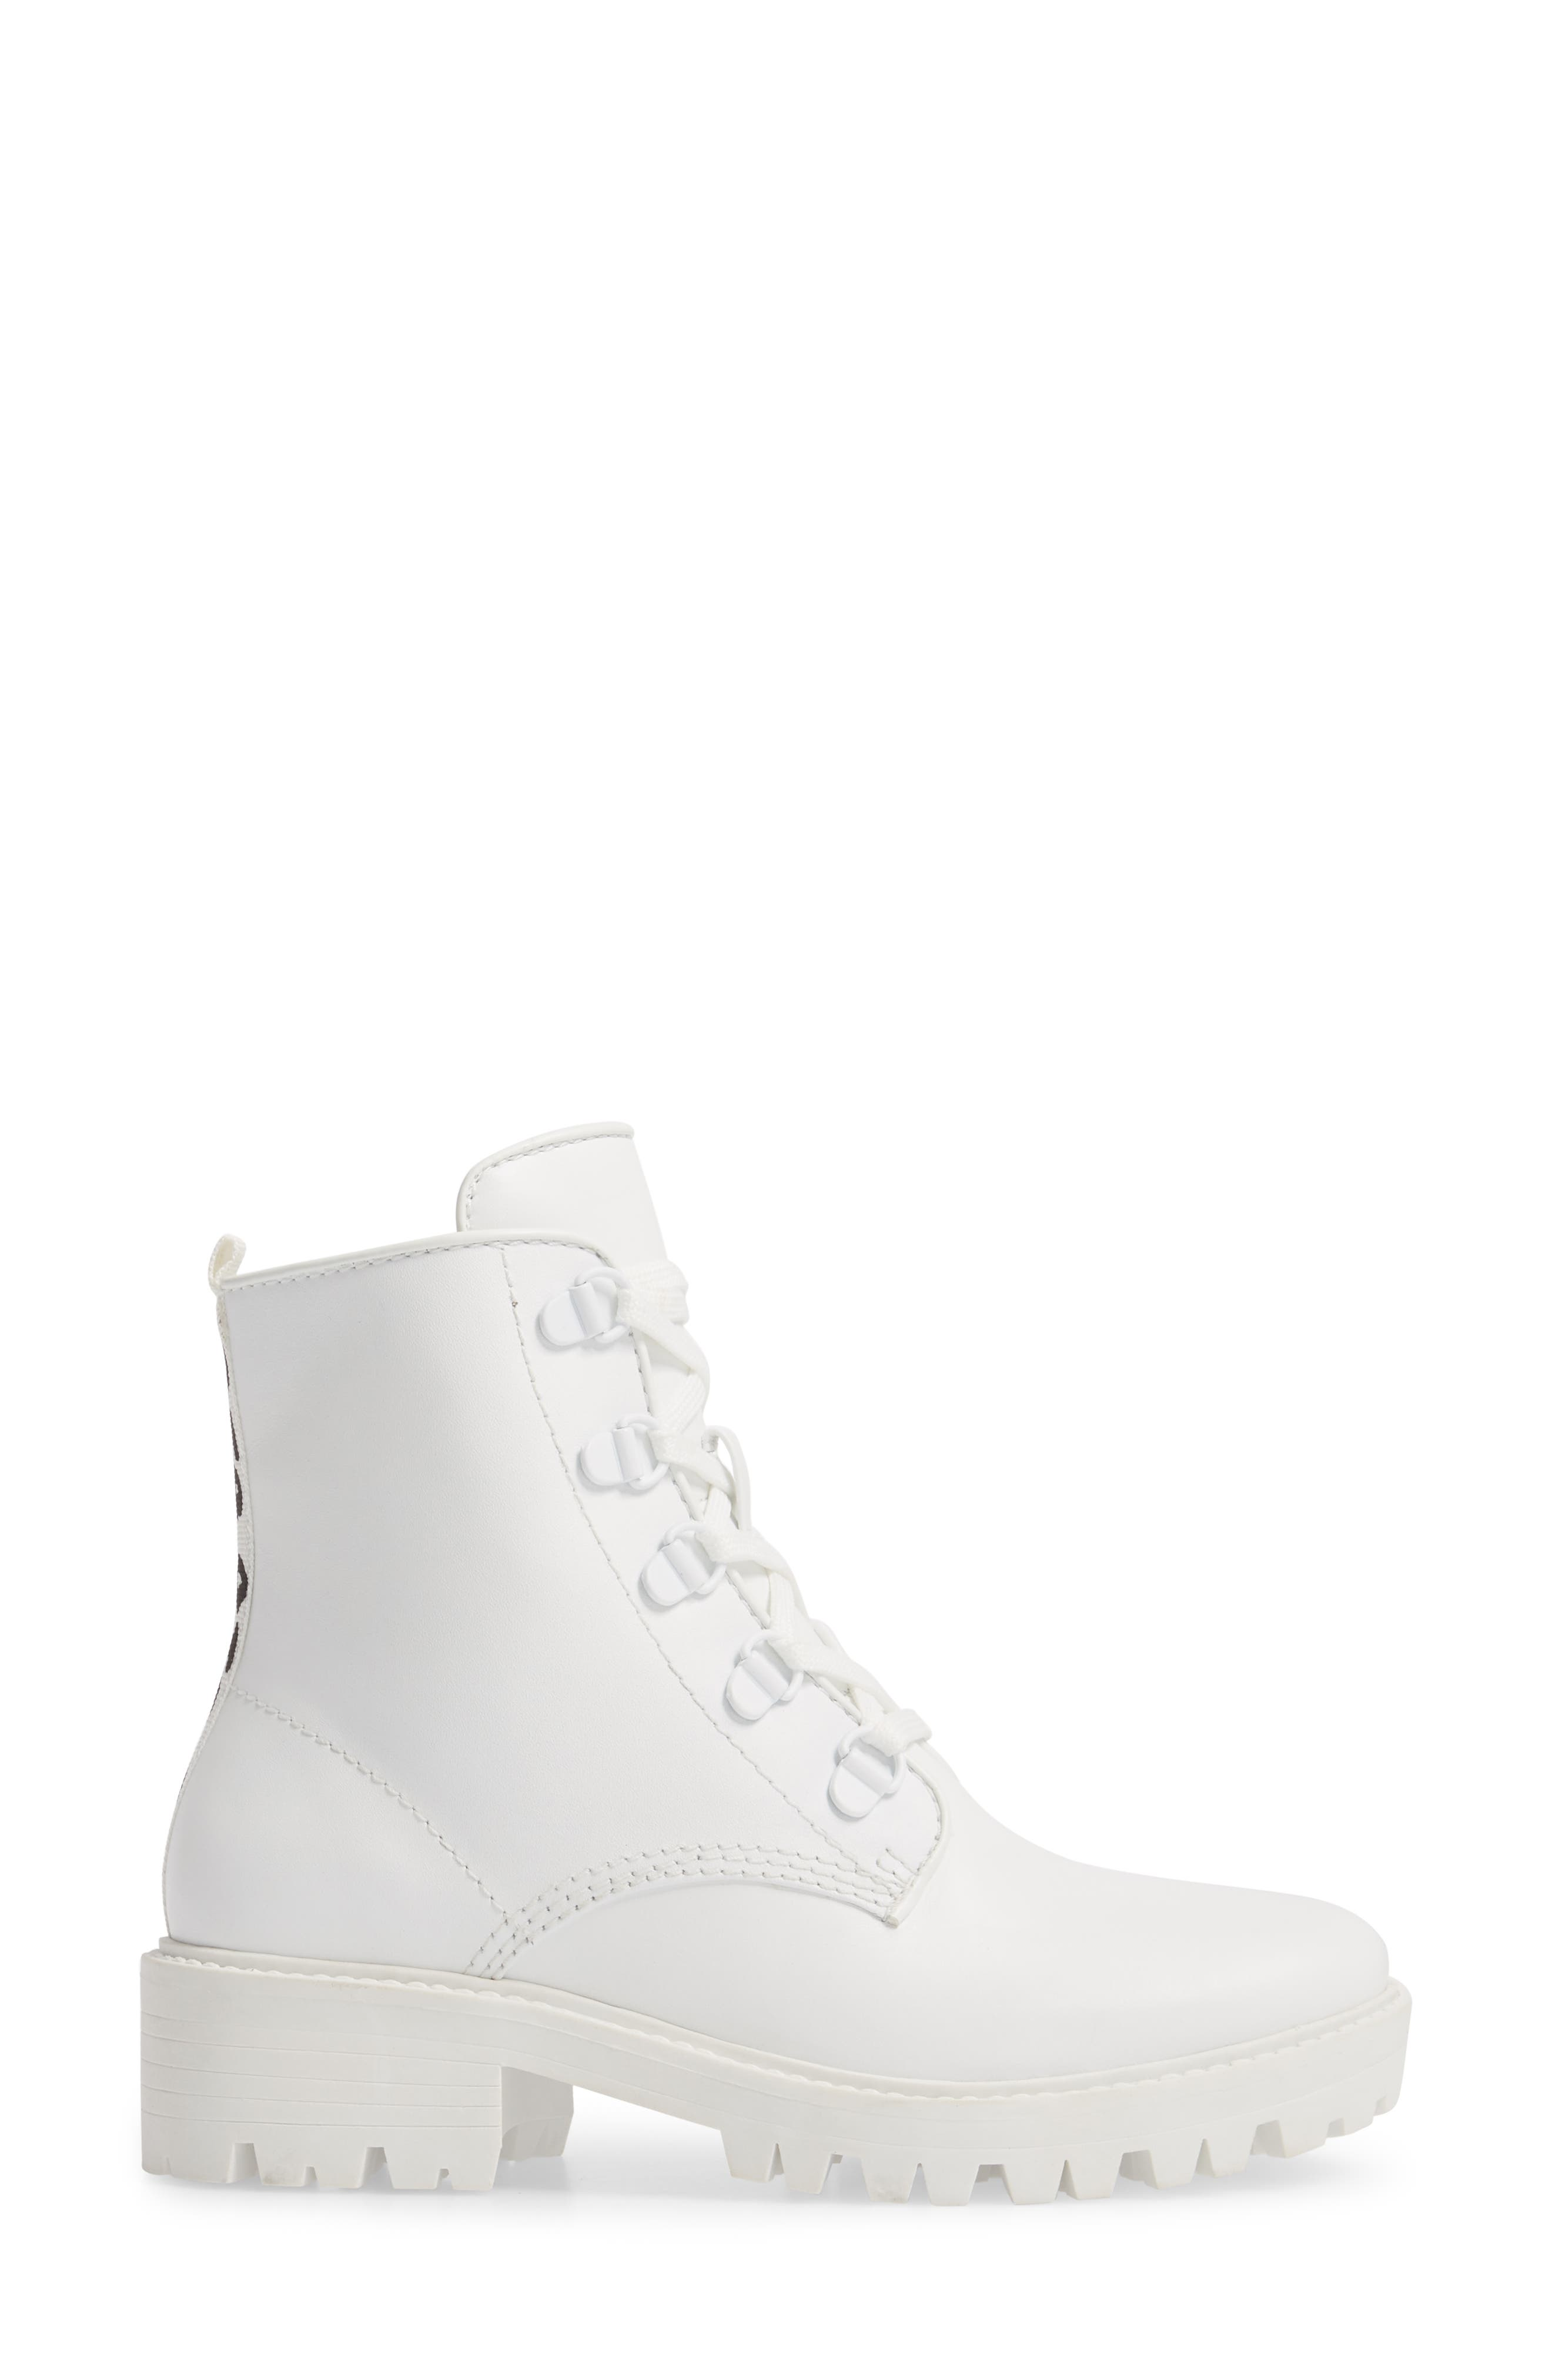 Military Boot,                             Alternate thumbnail 3, color,                             White/ White/ White